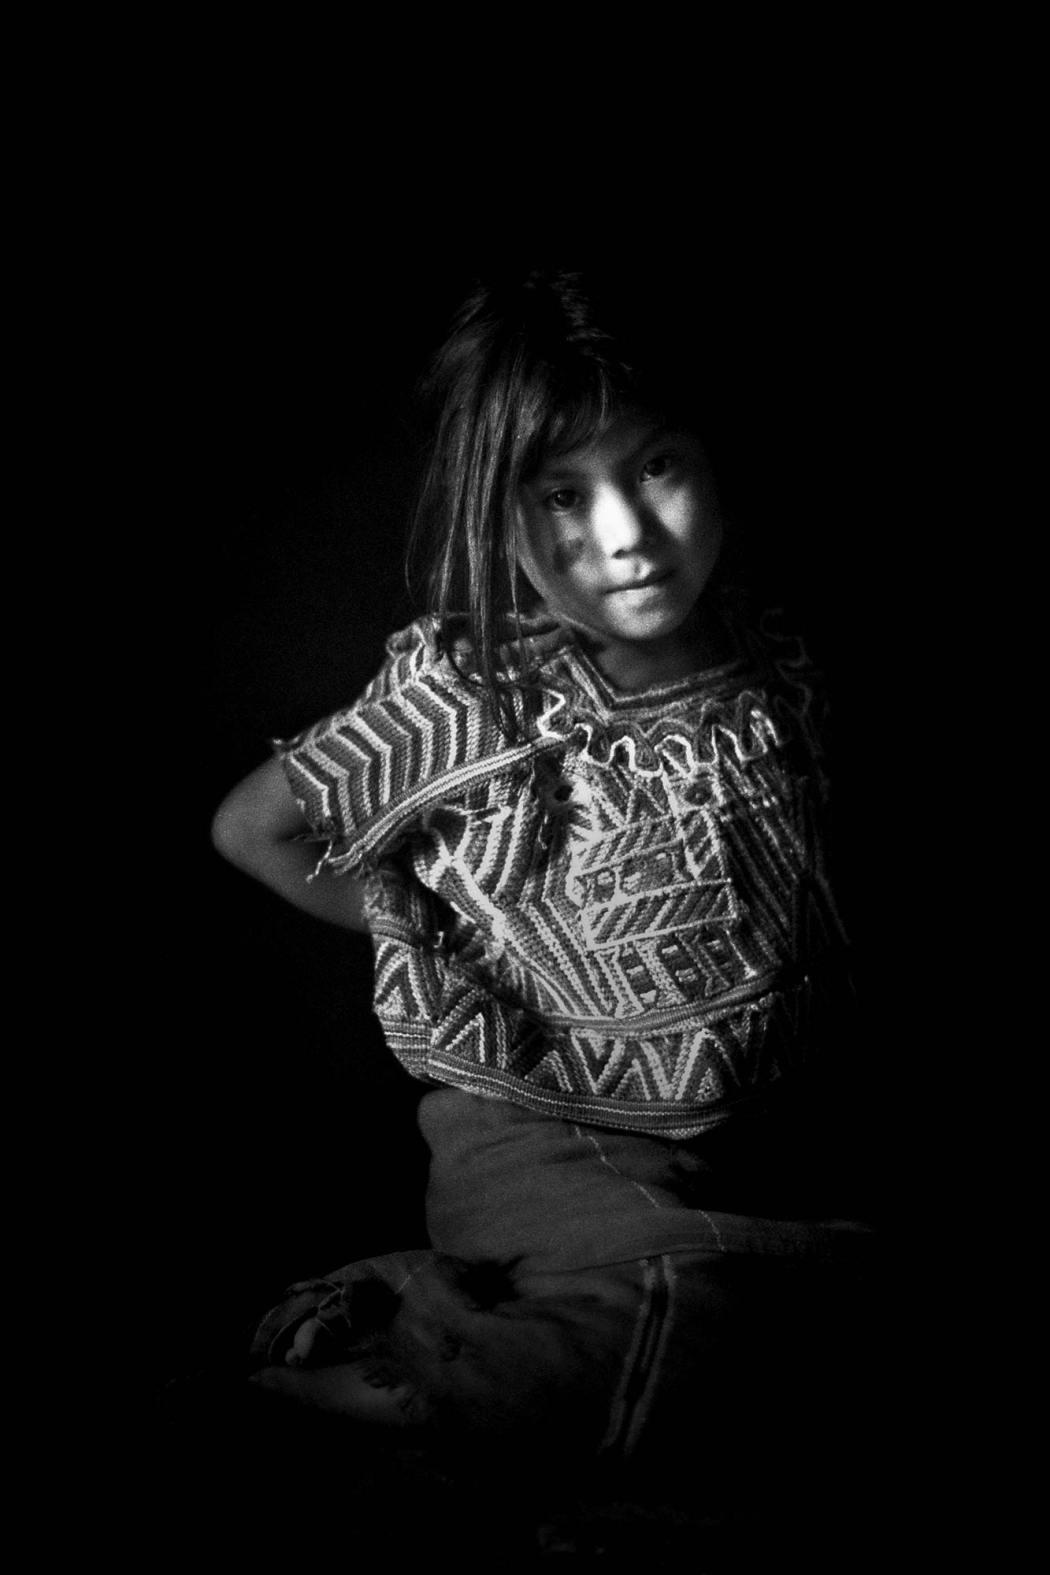 © Yasuhiro Ogawa, courtesy of Blue Lotus Gallery, 'untitled', Guatemala, 1997 [The Dreaming, pg 018]